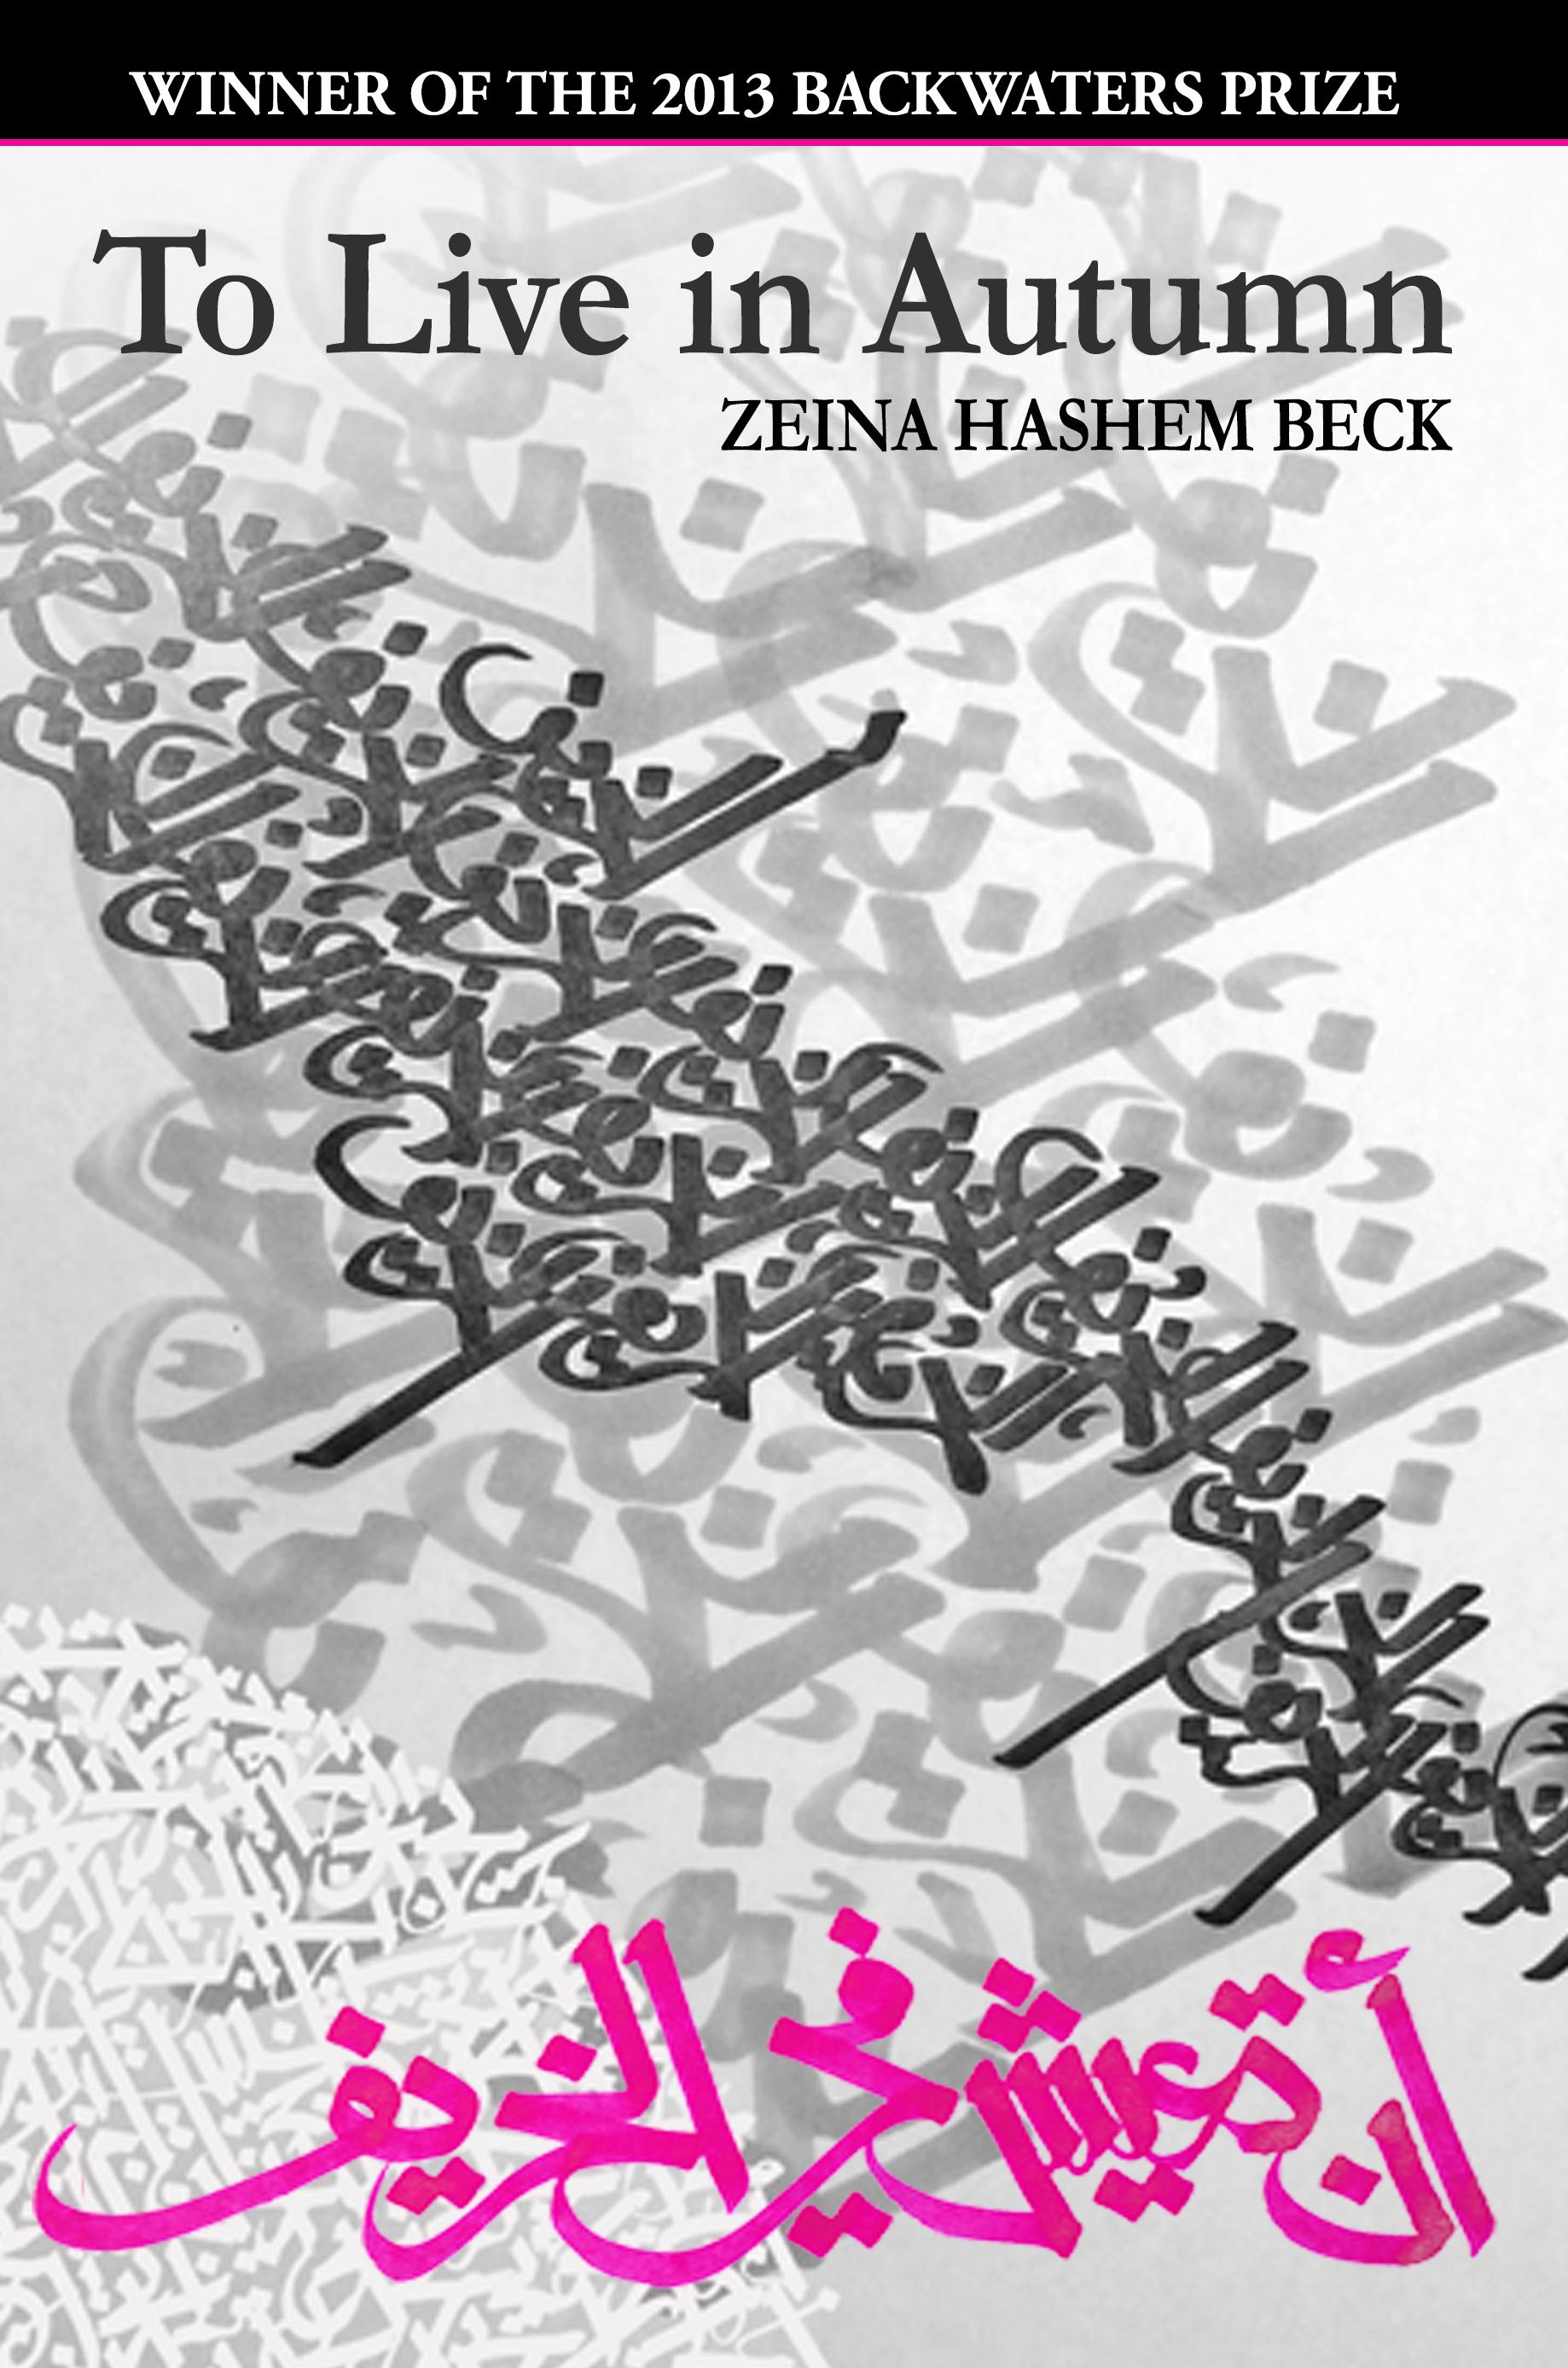 Cover by Yazan Halawani